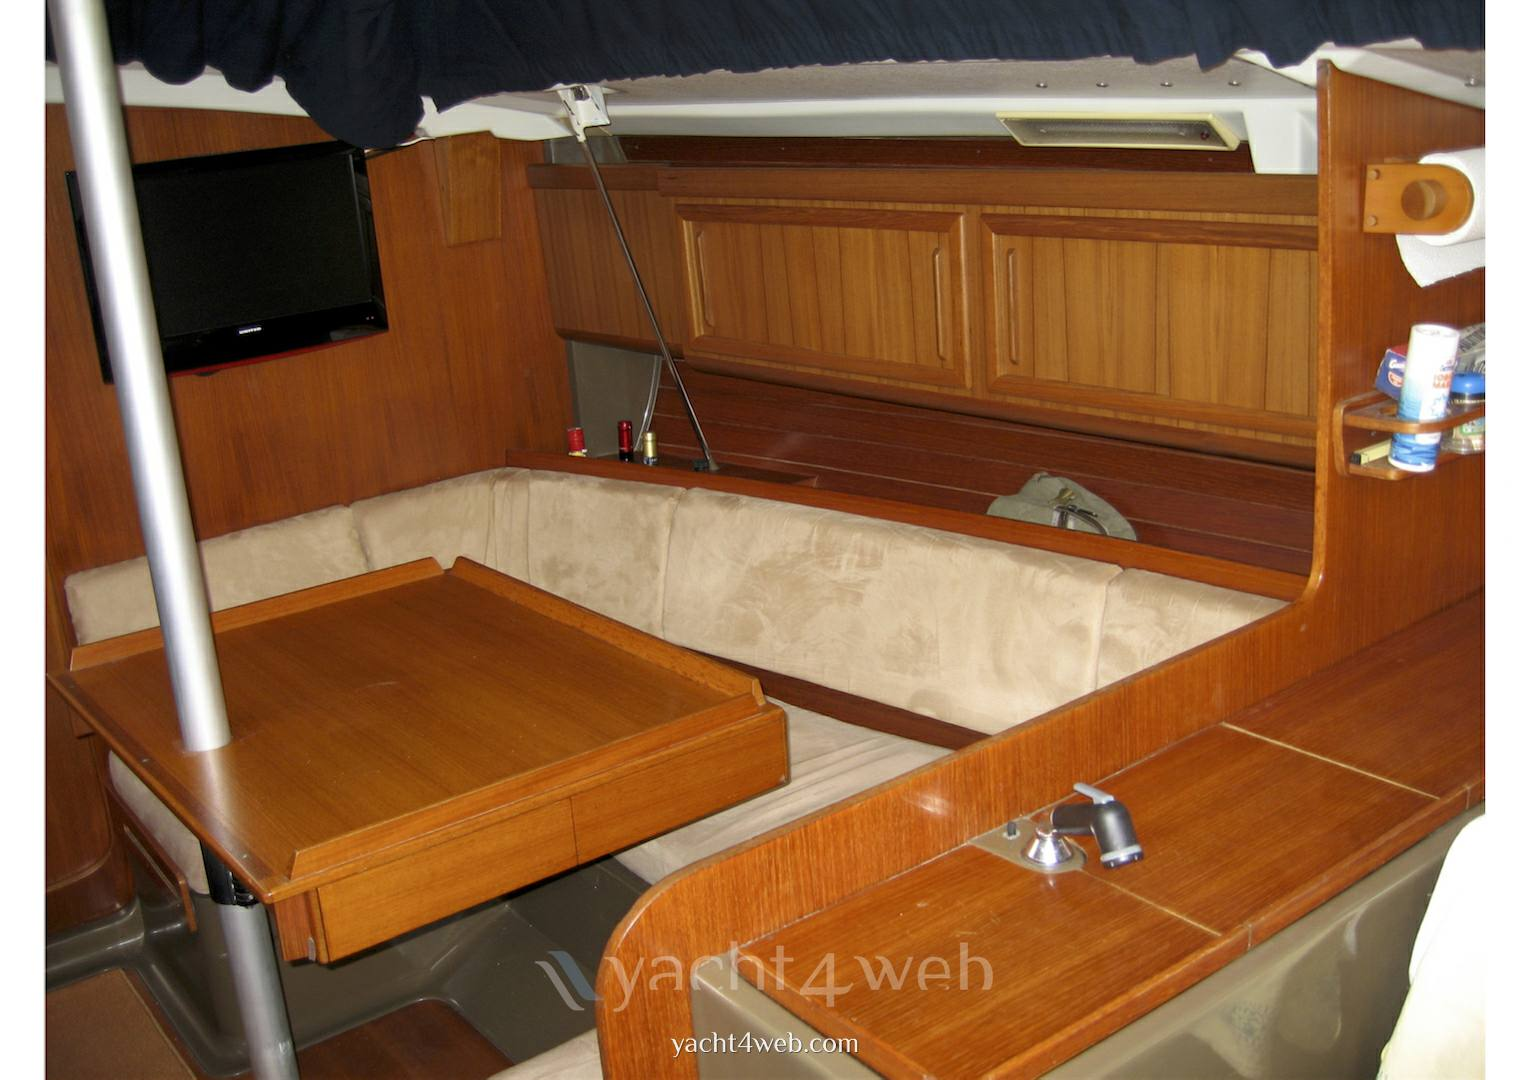 Cantire-del-pardo Grand soleil 34 Cruiser used